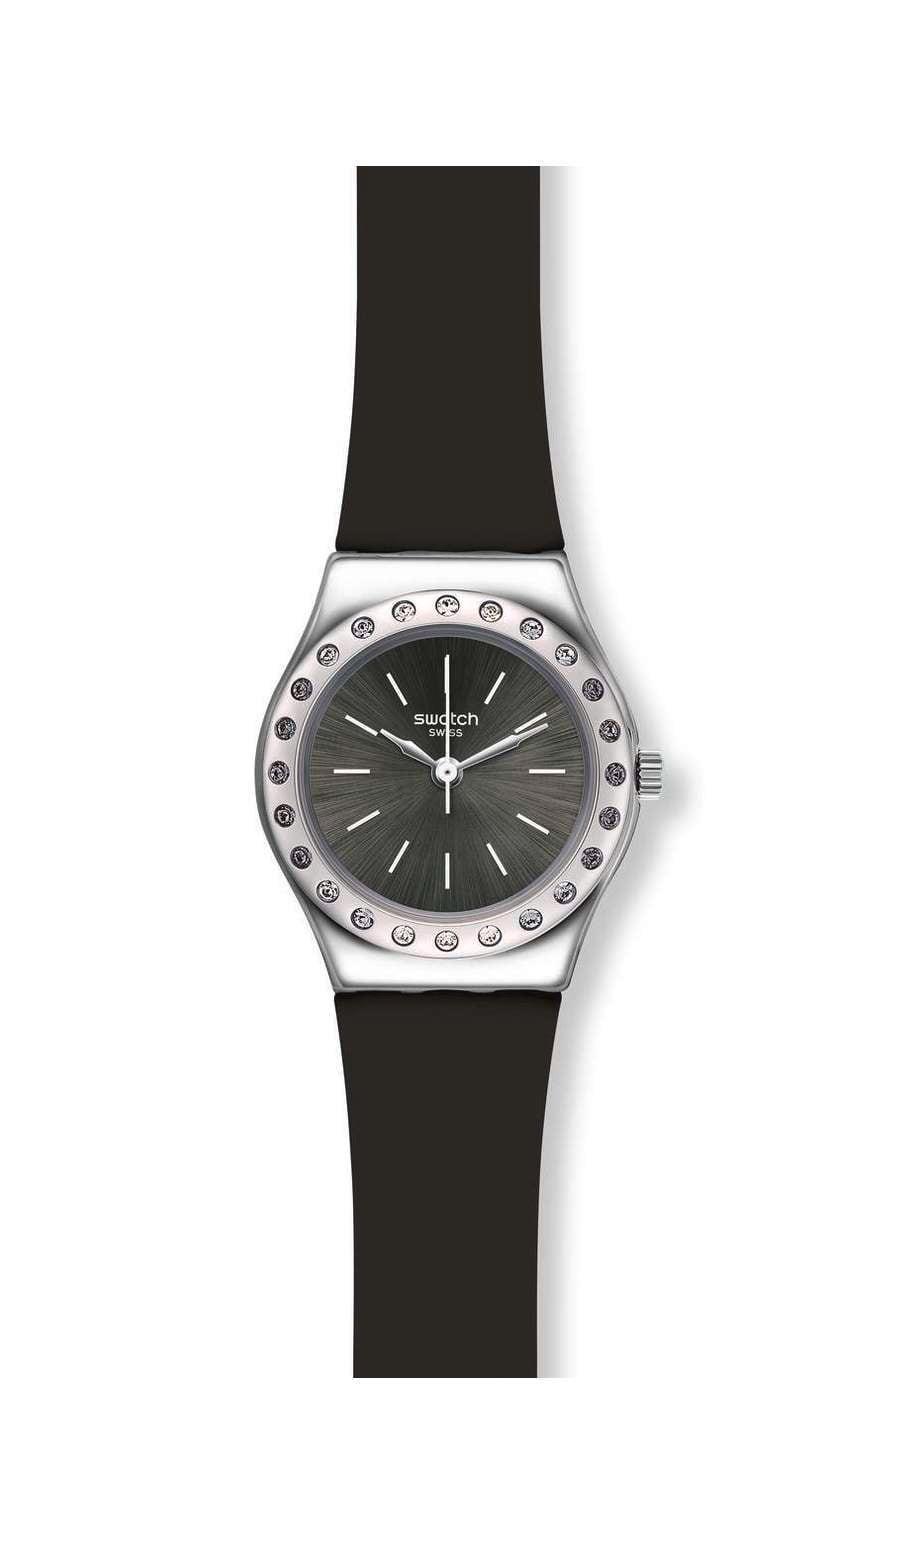 Swatch - CAMANOIR - 1